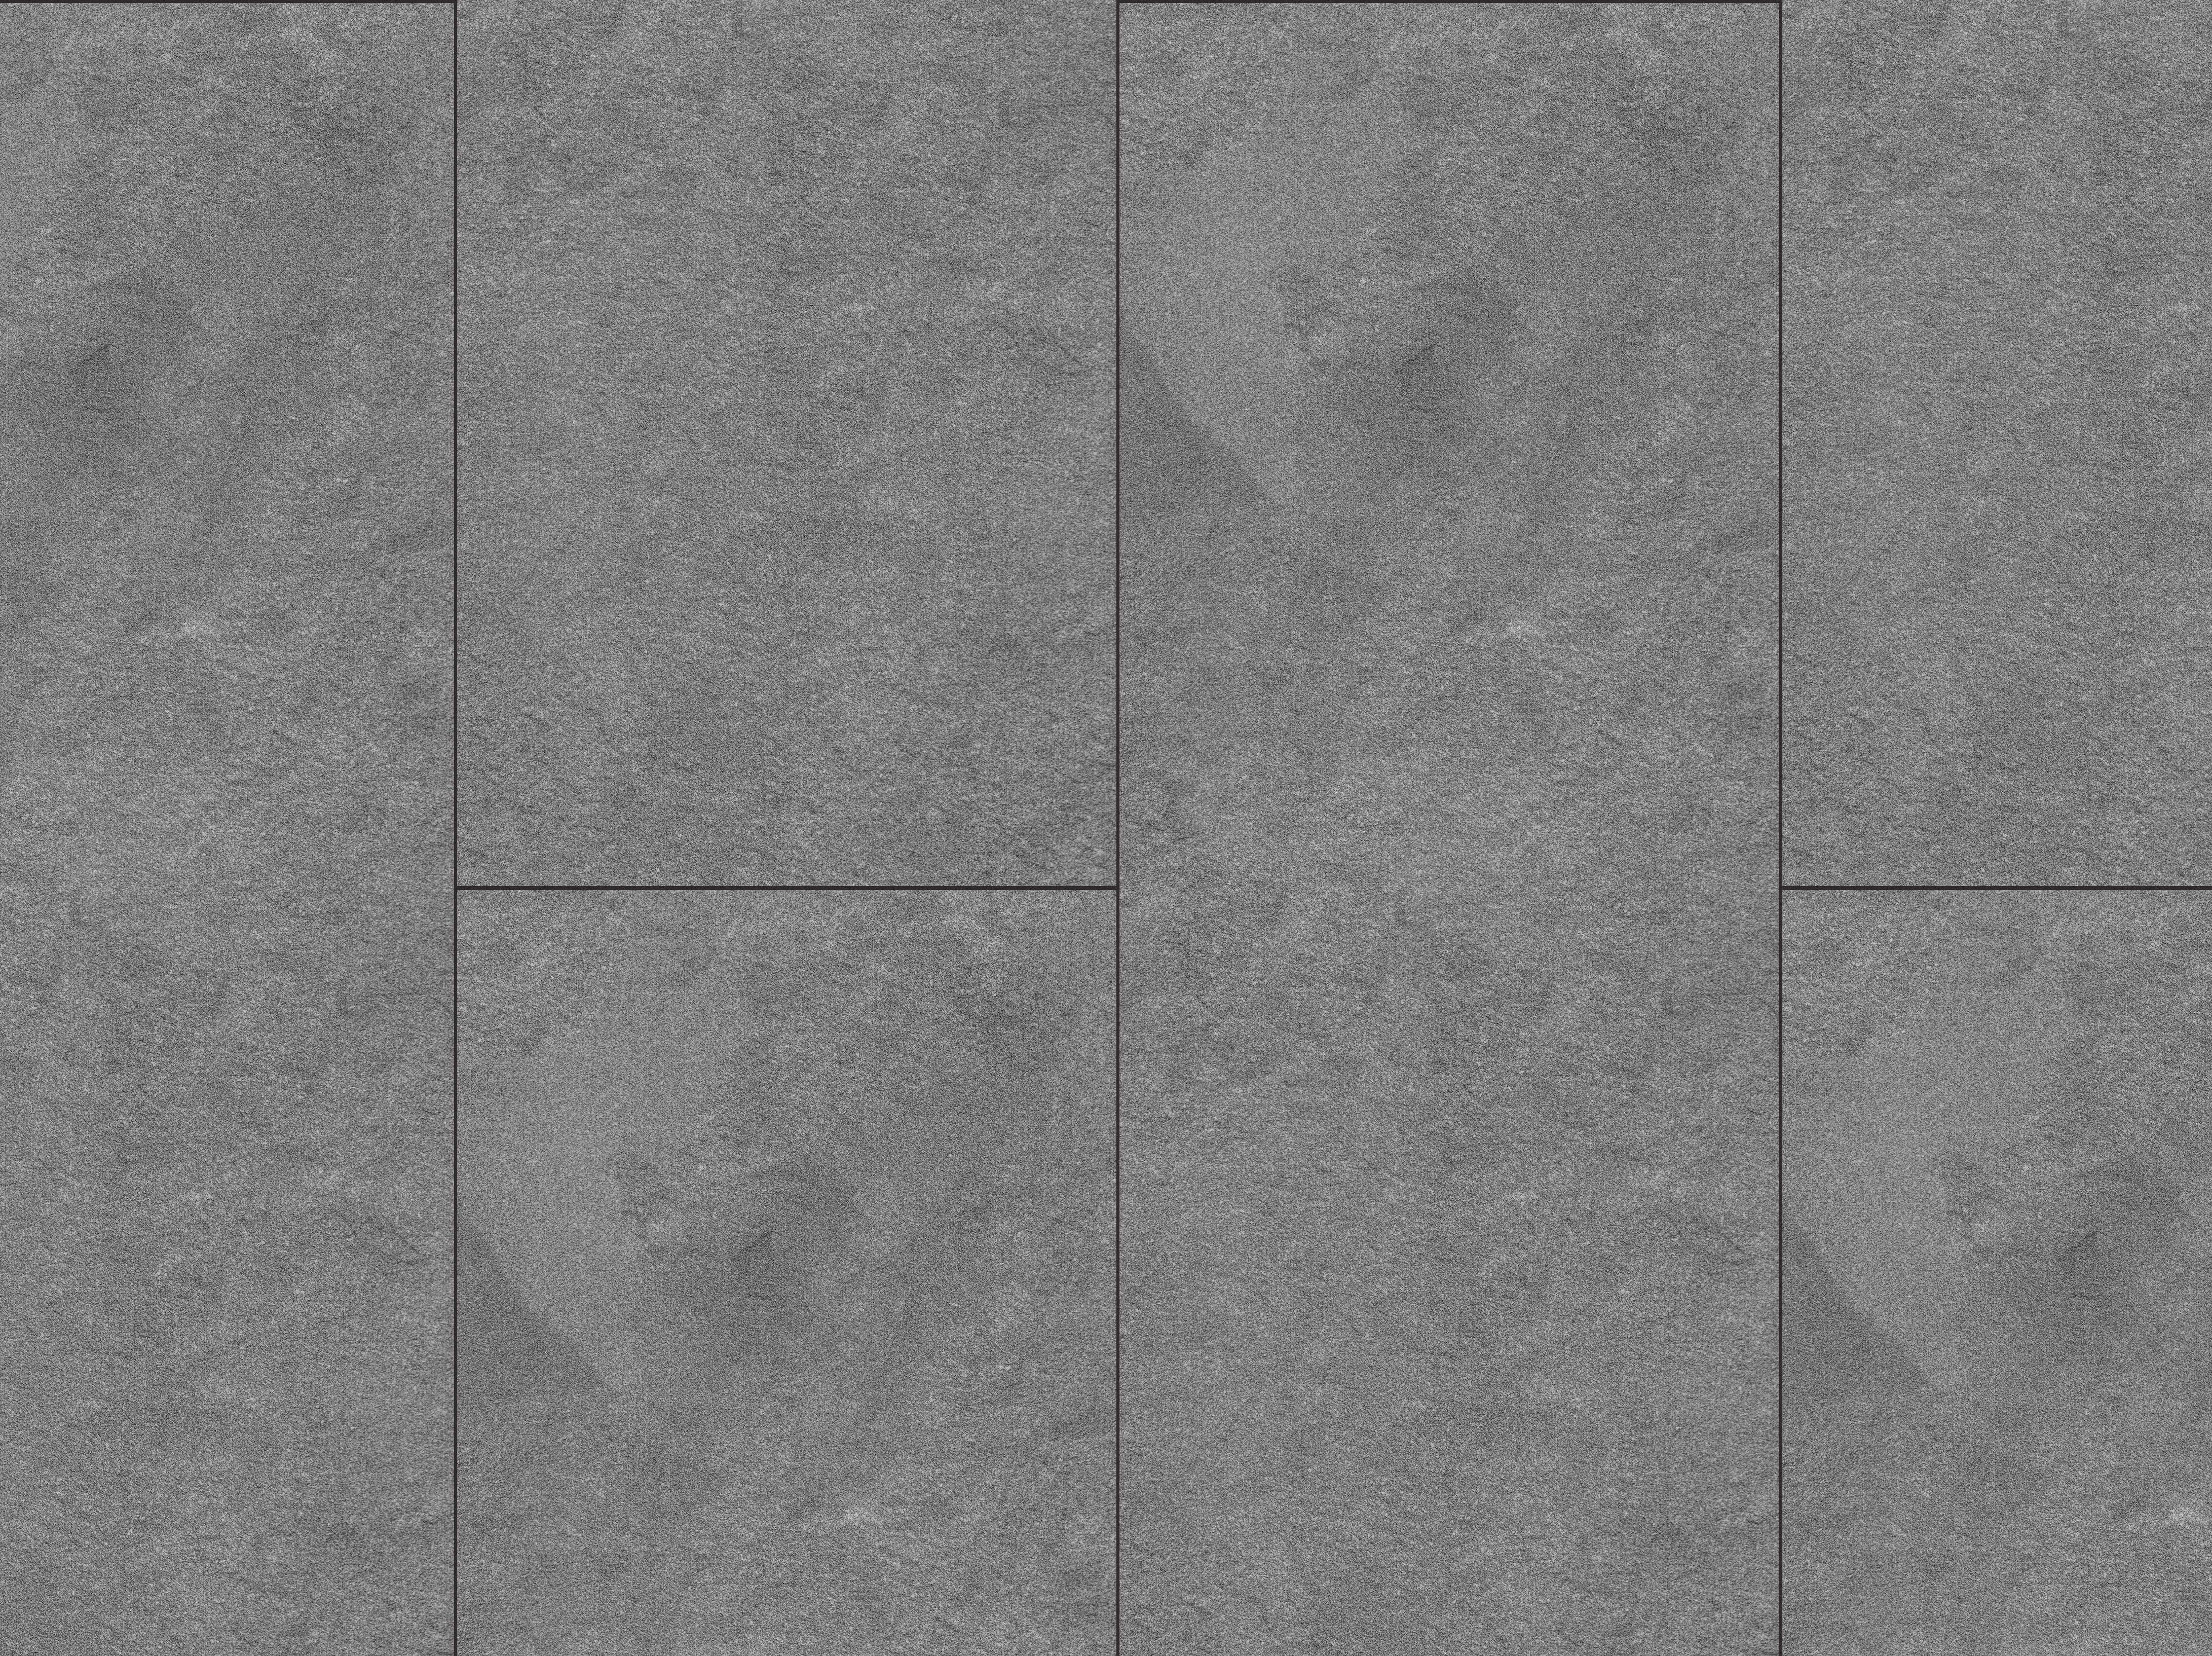 Tile Floor Textures Seamless Flooring Tiles texture